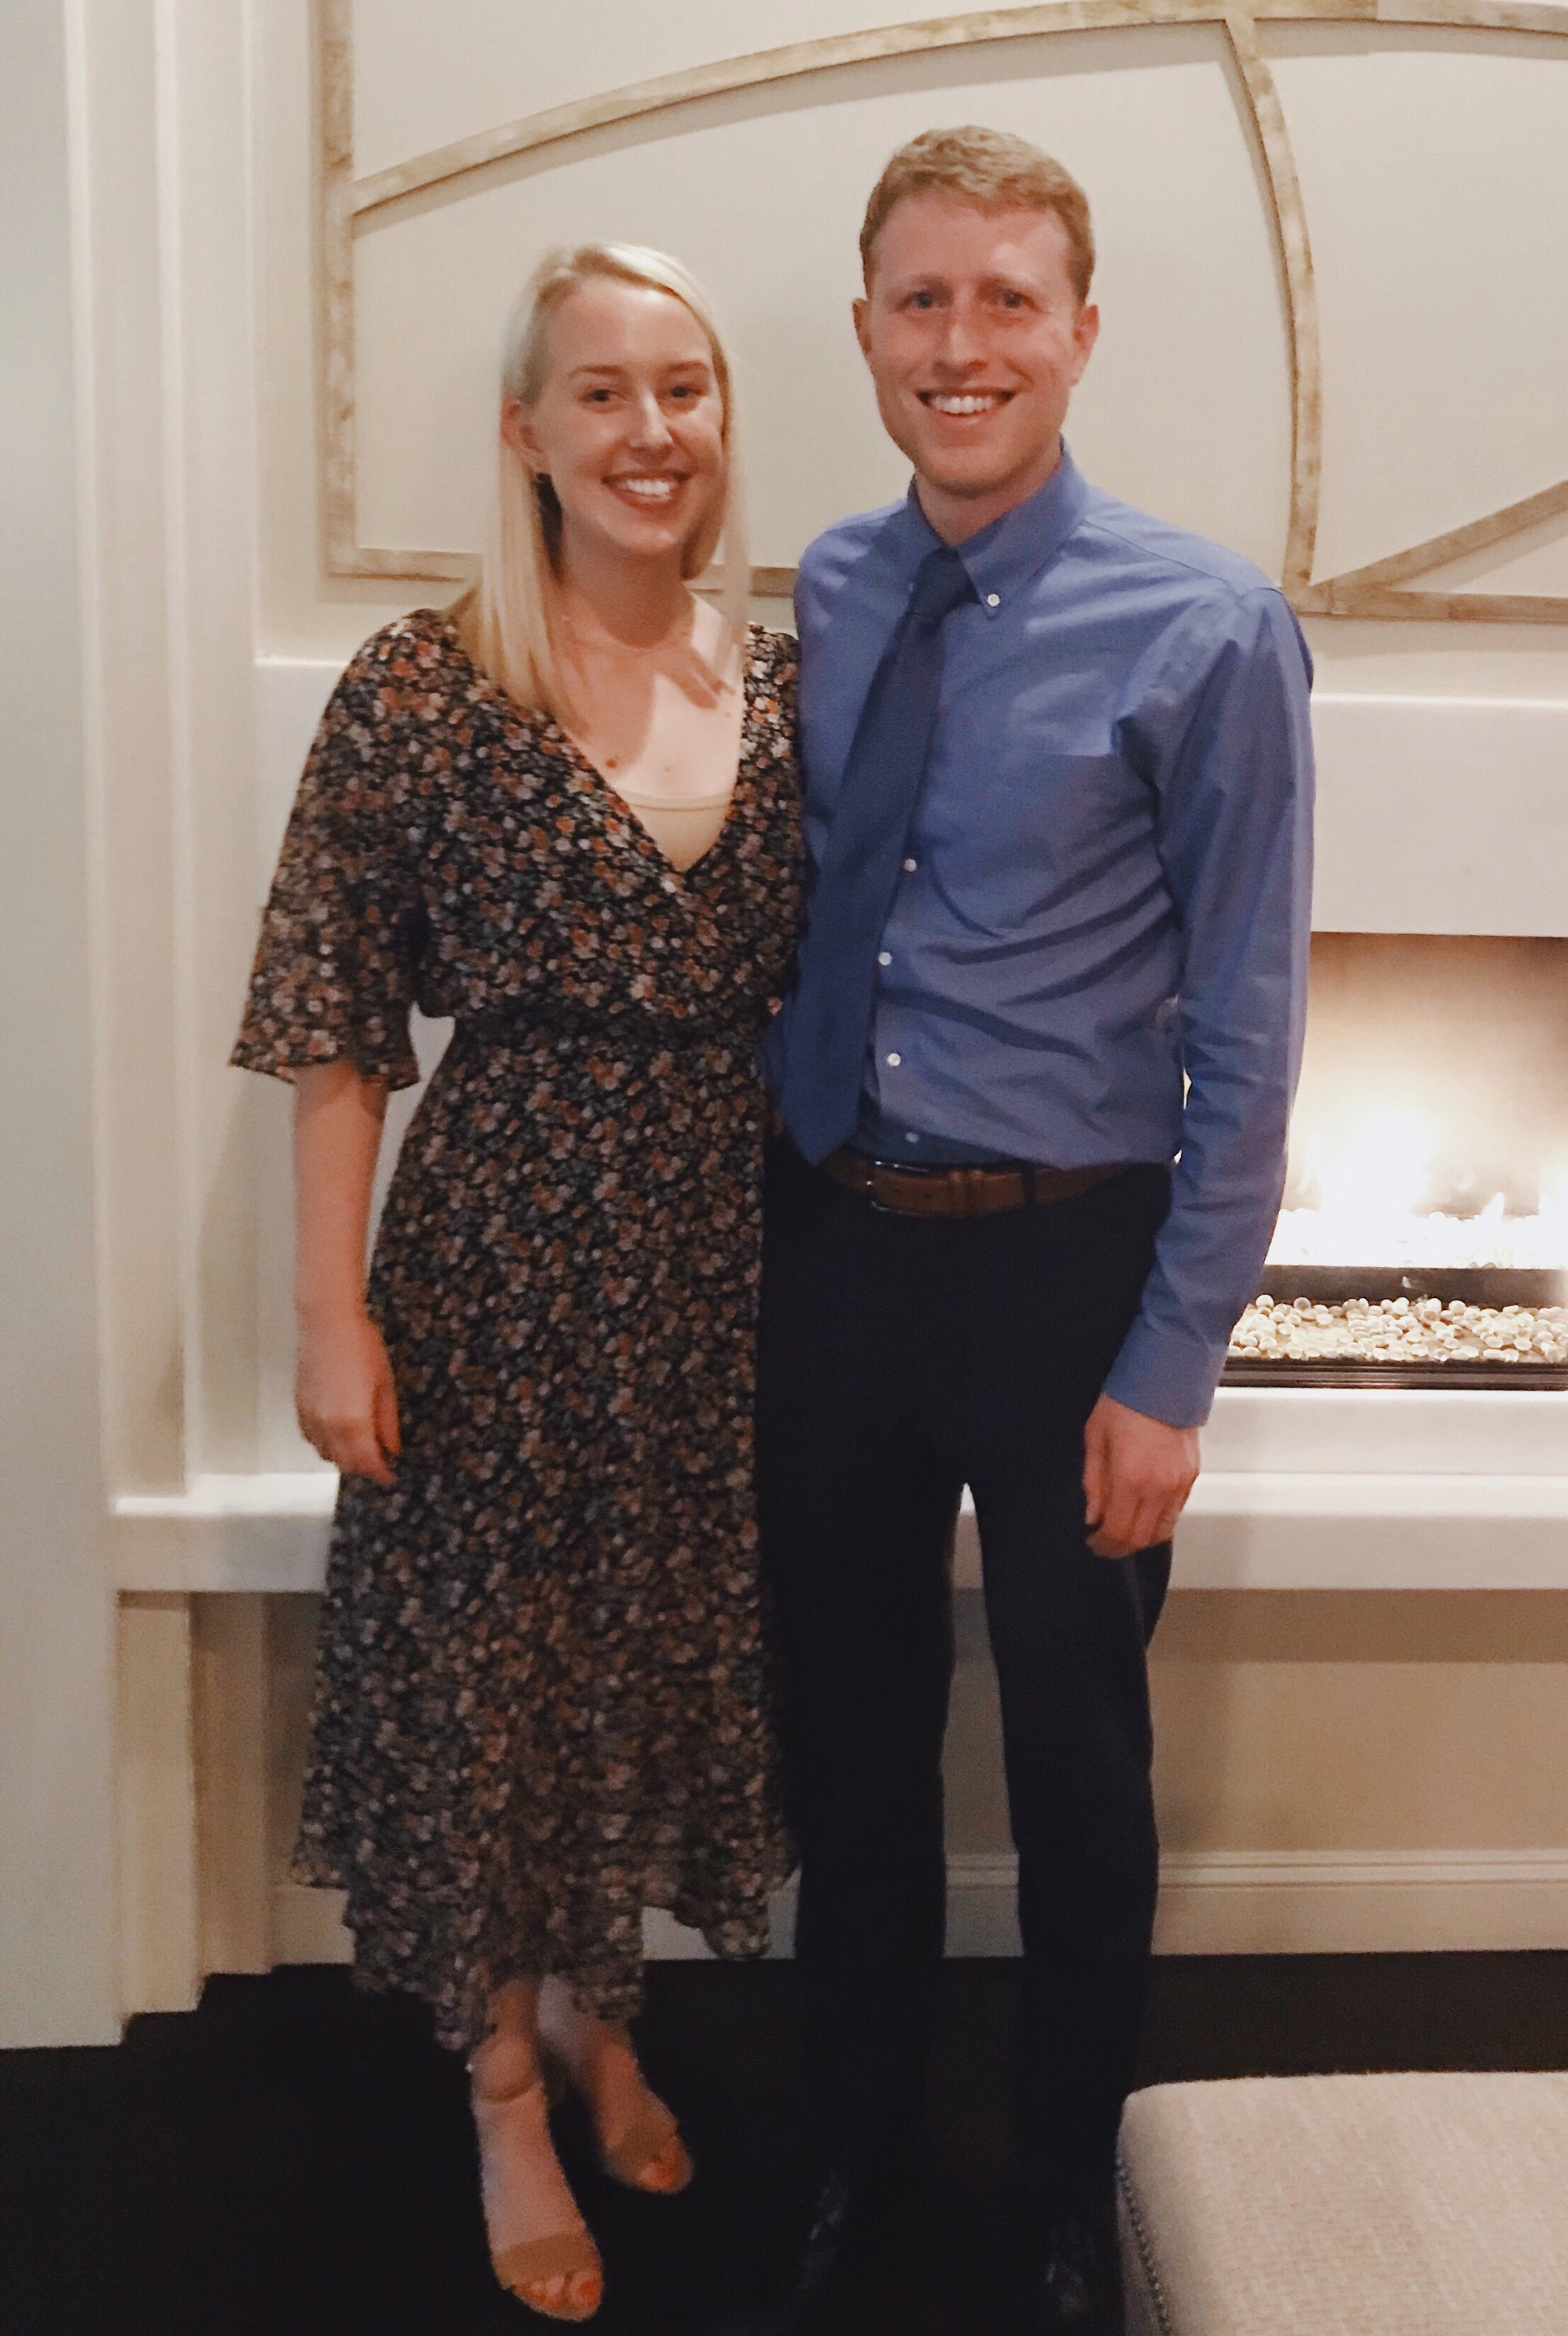 Dress is  Rebecca Minkoff ; Shoes are  Sam Edelman